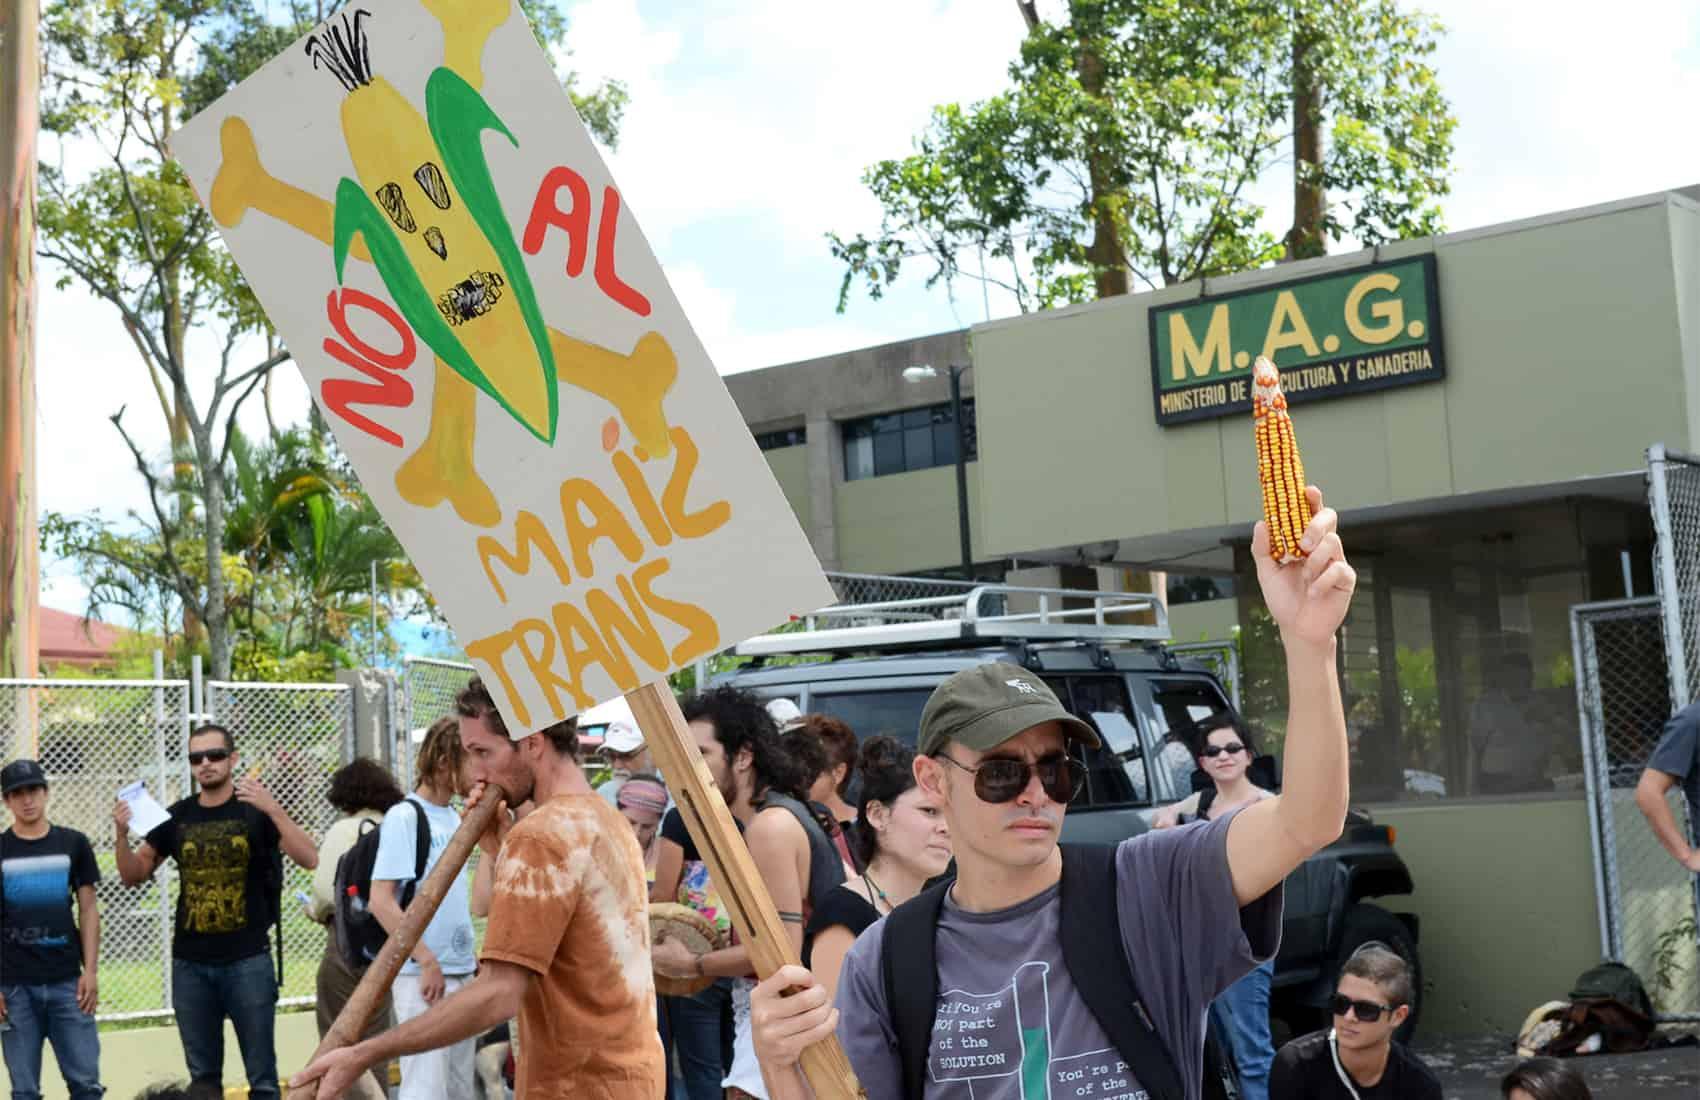 Anti-GMO demonstration